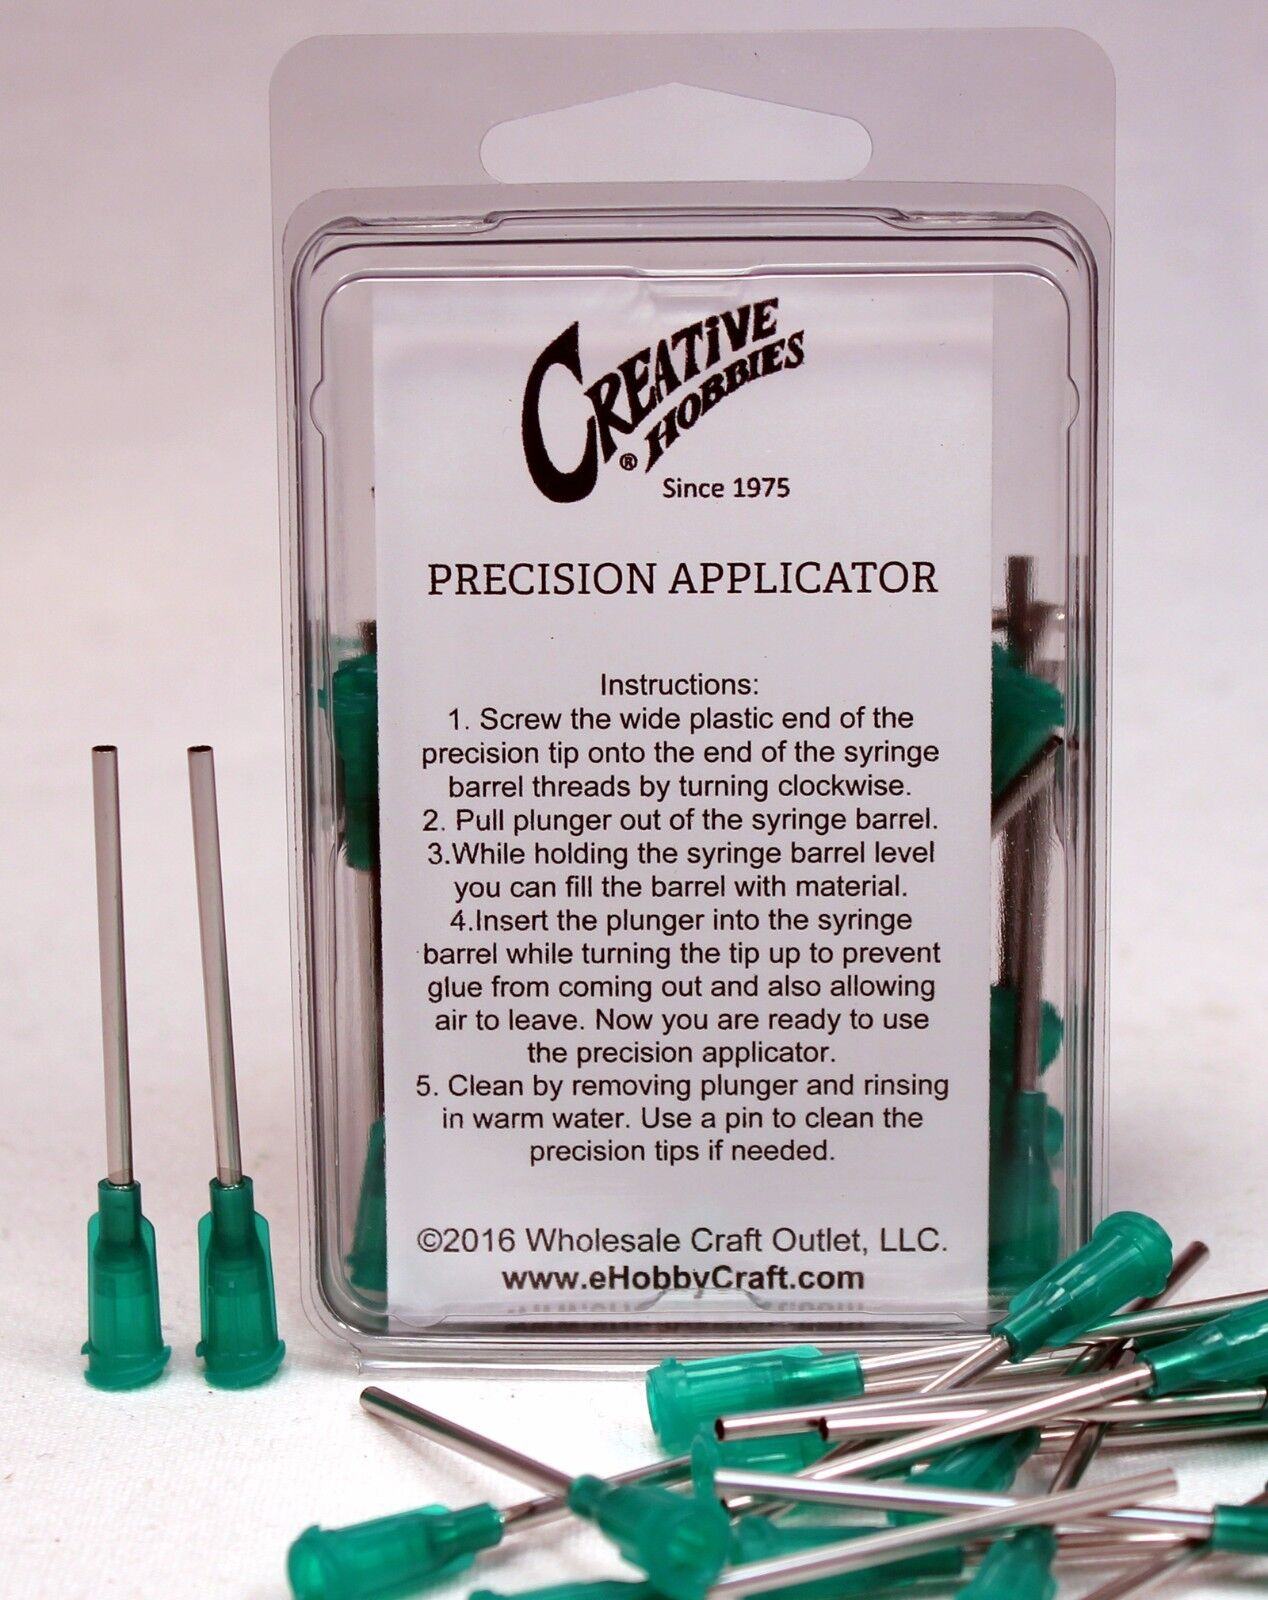 14 Gauge 1.5 Inch, Precision Applicator Dispensing Needle Tips, 50 Pieces Adhesive Guns & Dispensers